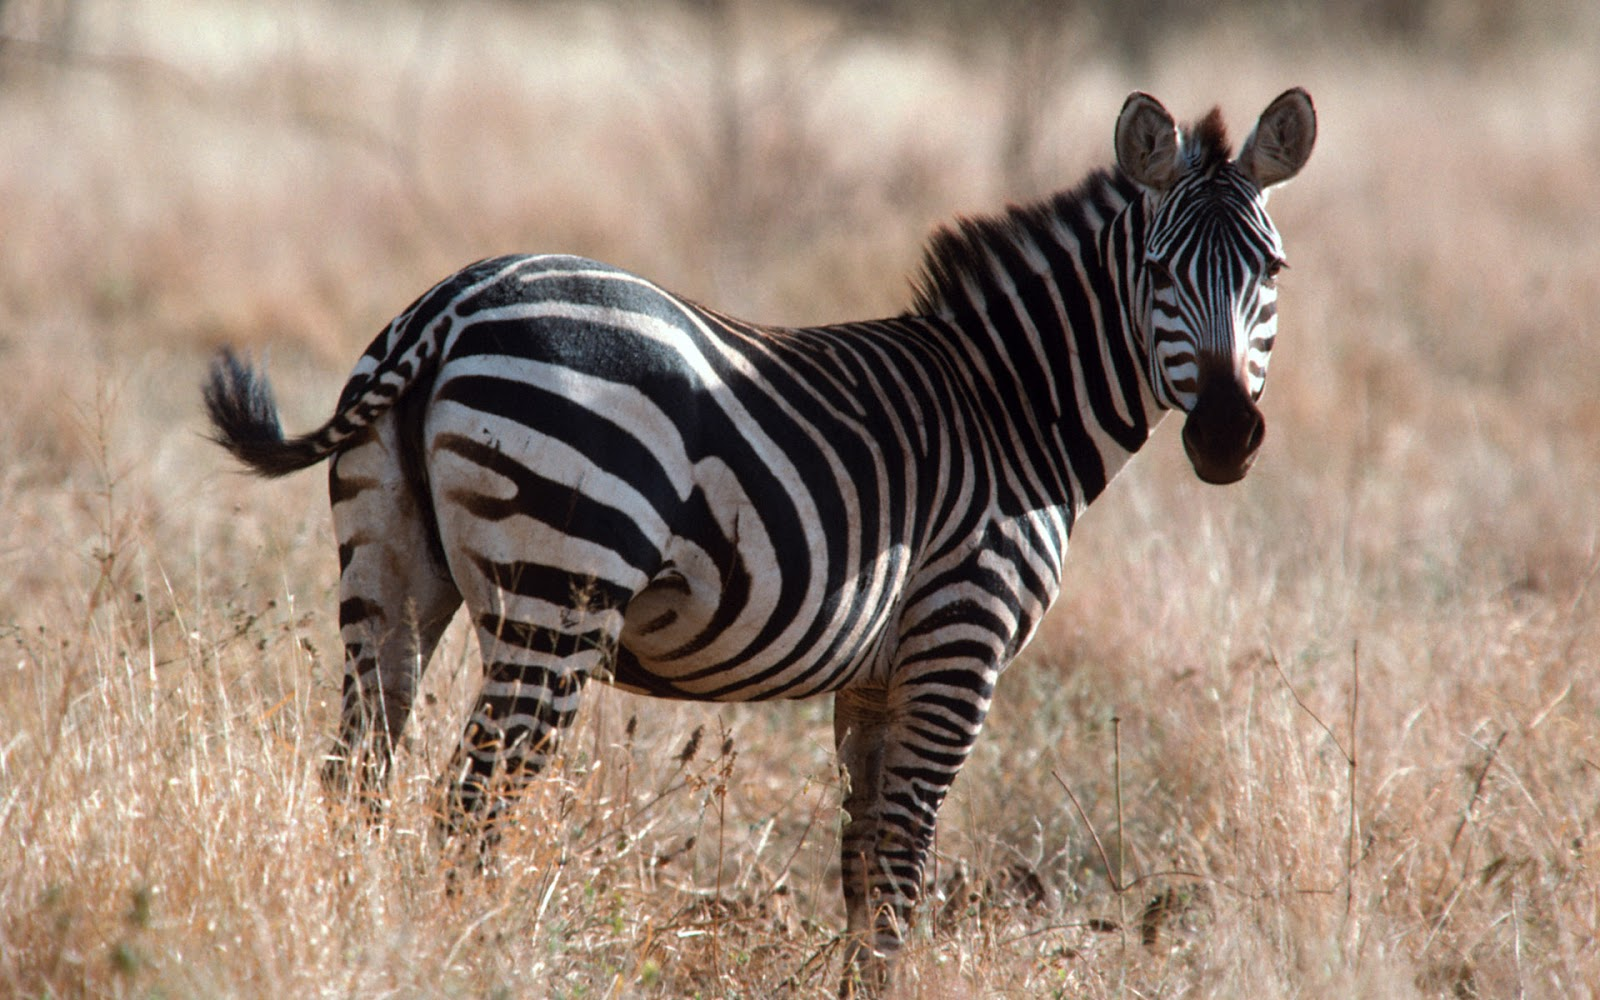 zebra zebras african animal facts wildlife photographs whinny eat